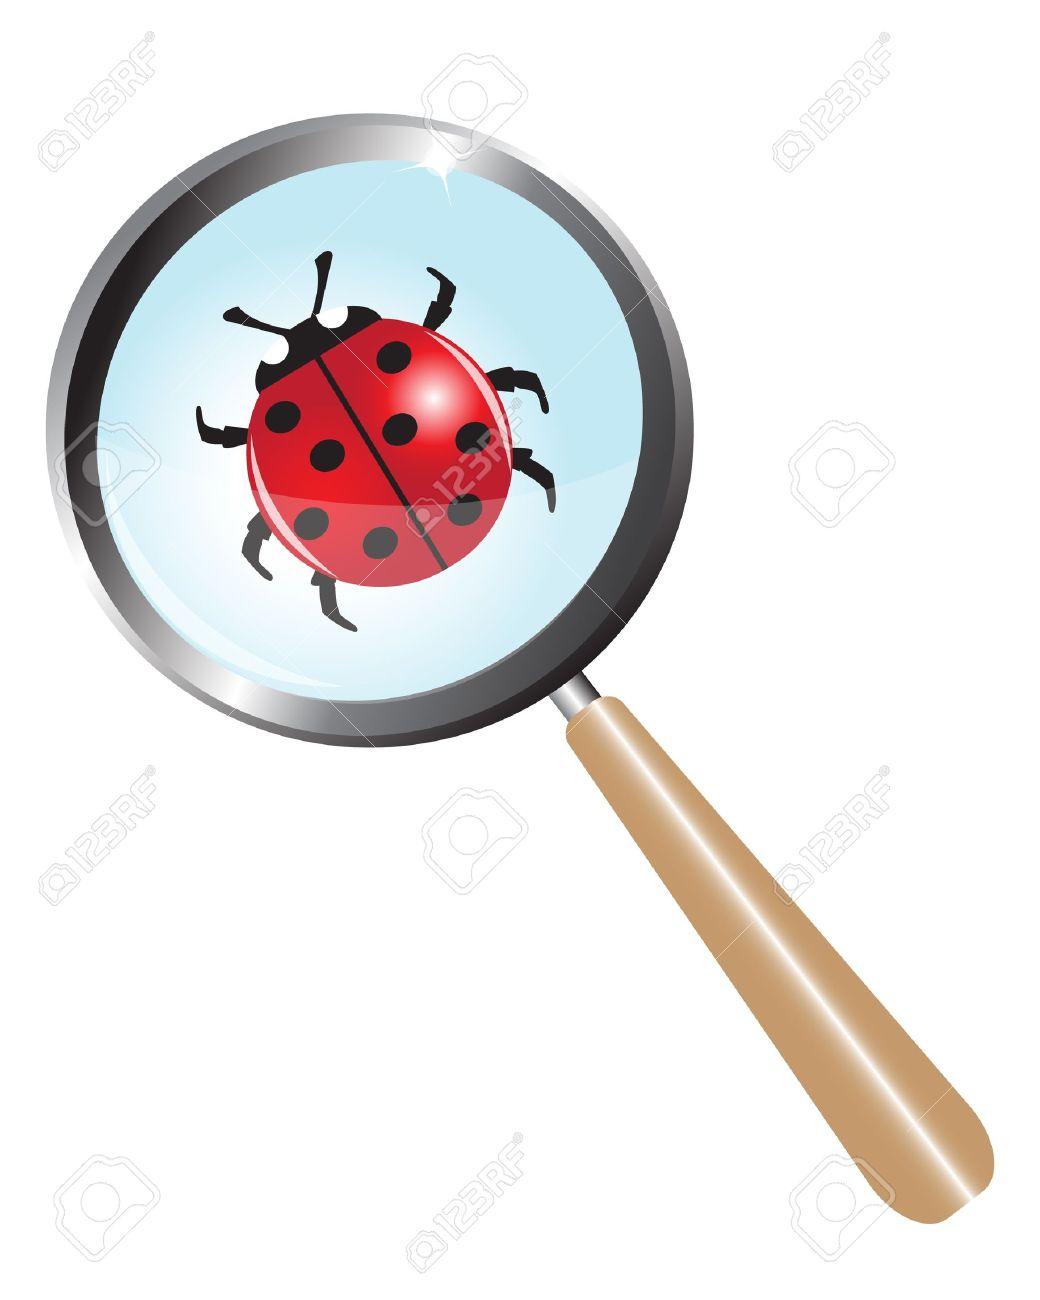 ladybug under a magnifying glass - 15516087